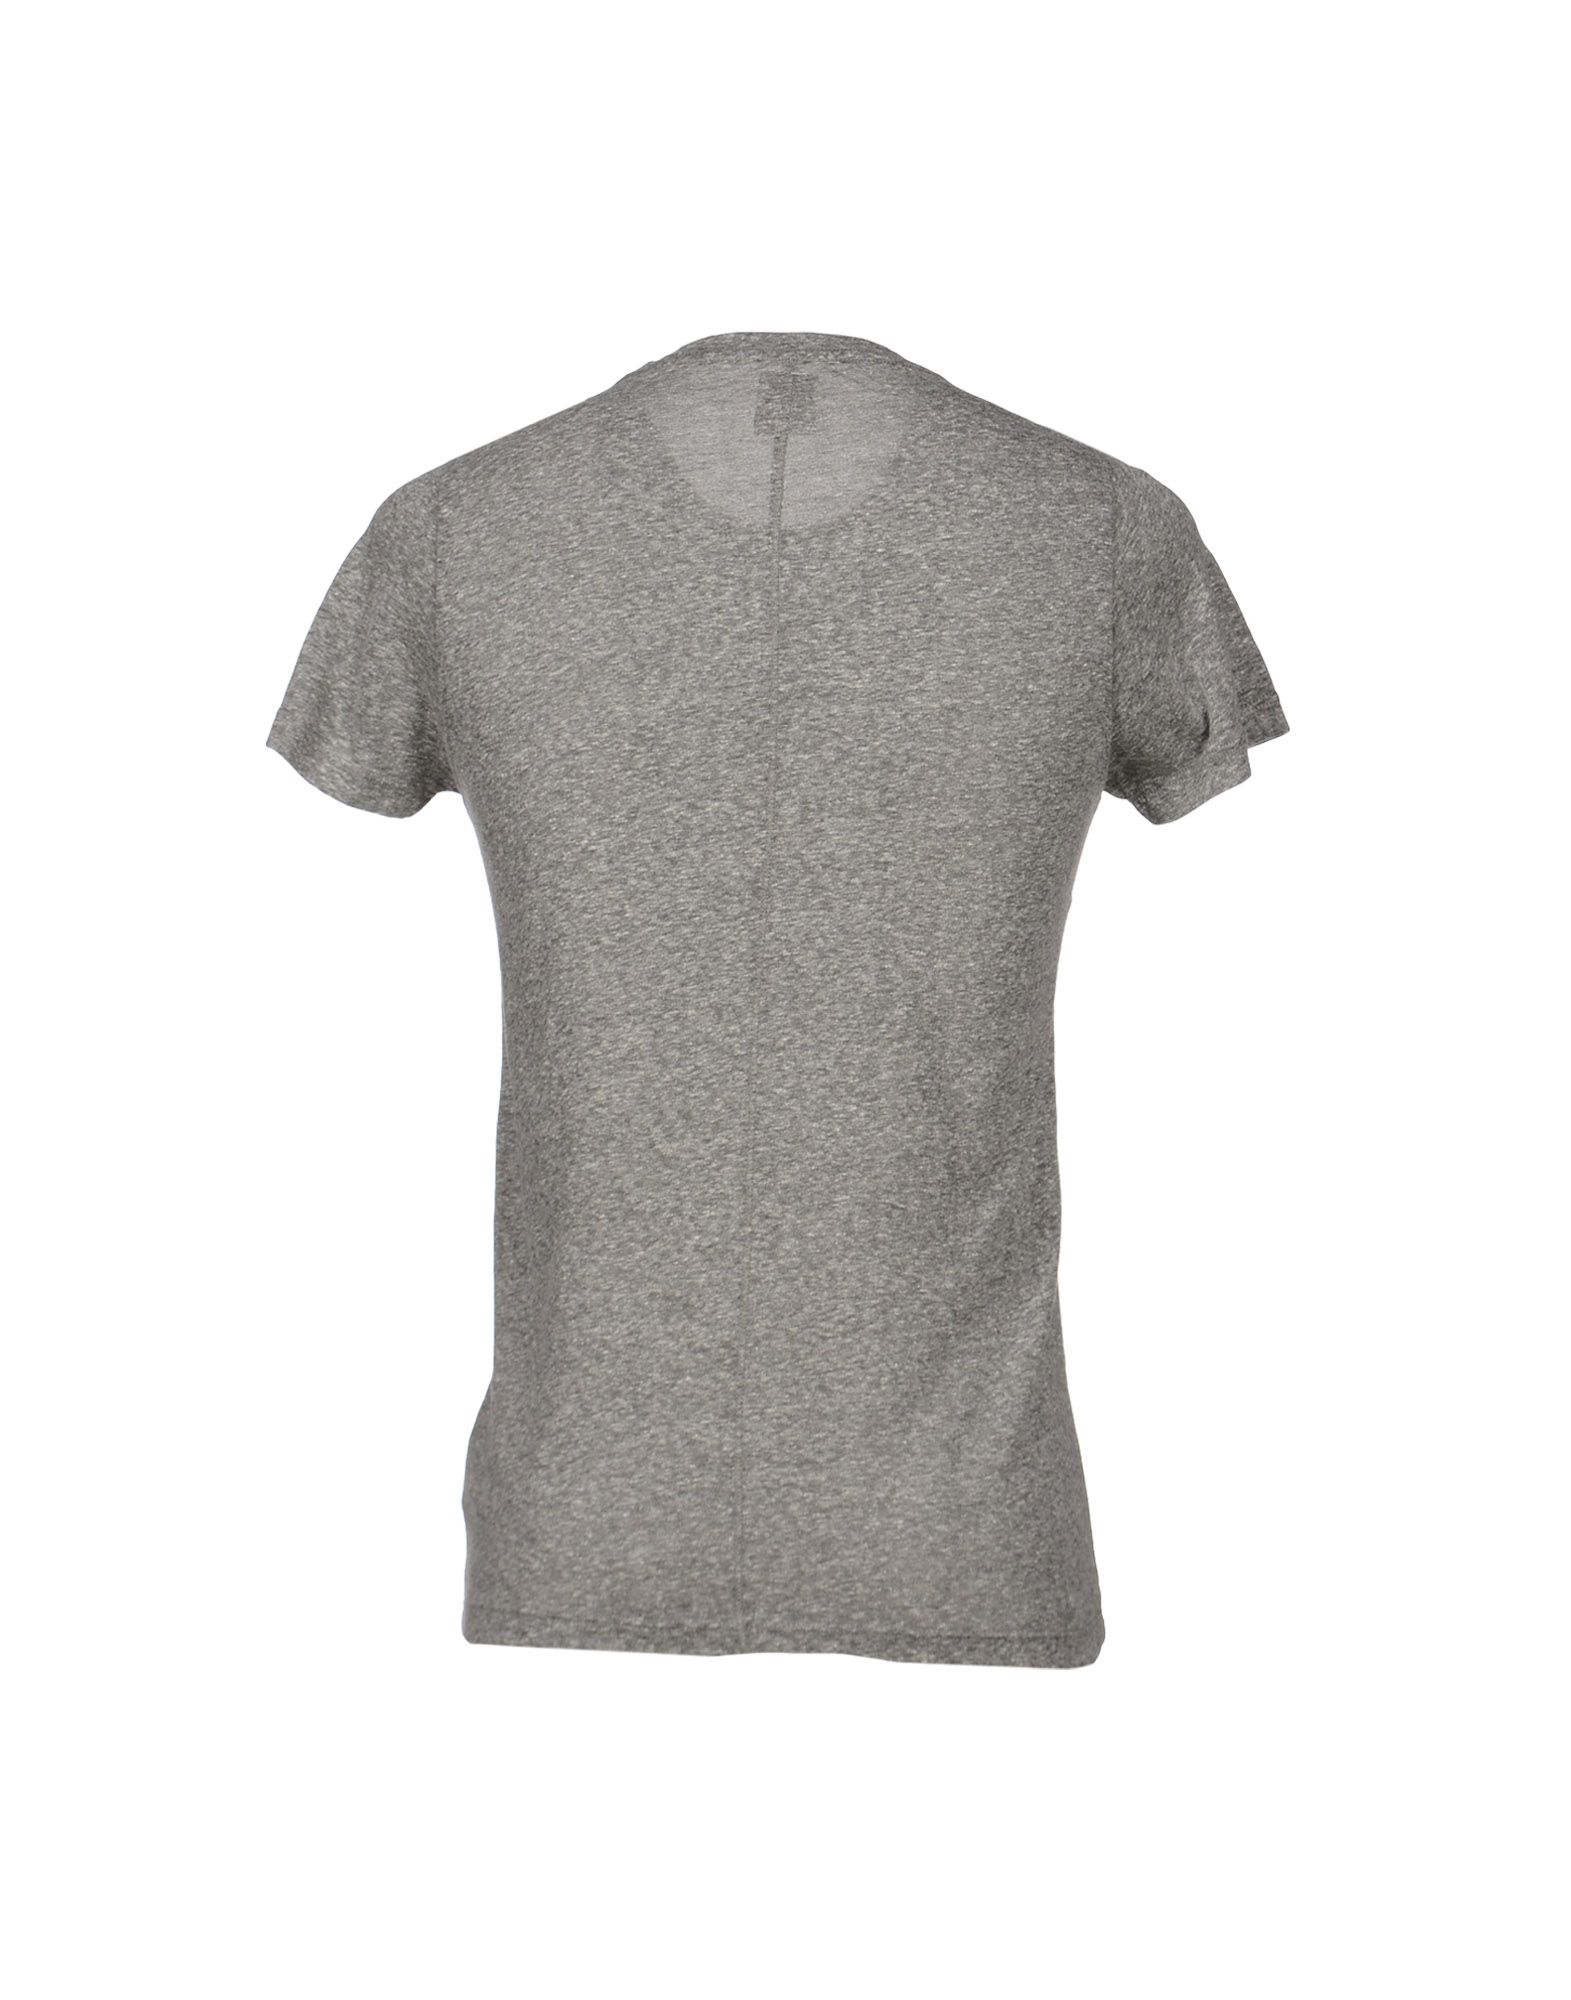 Kaos T-shirt in Gray for Men (Grey)   Lyst